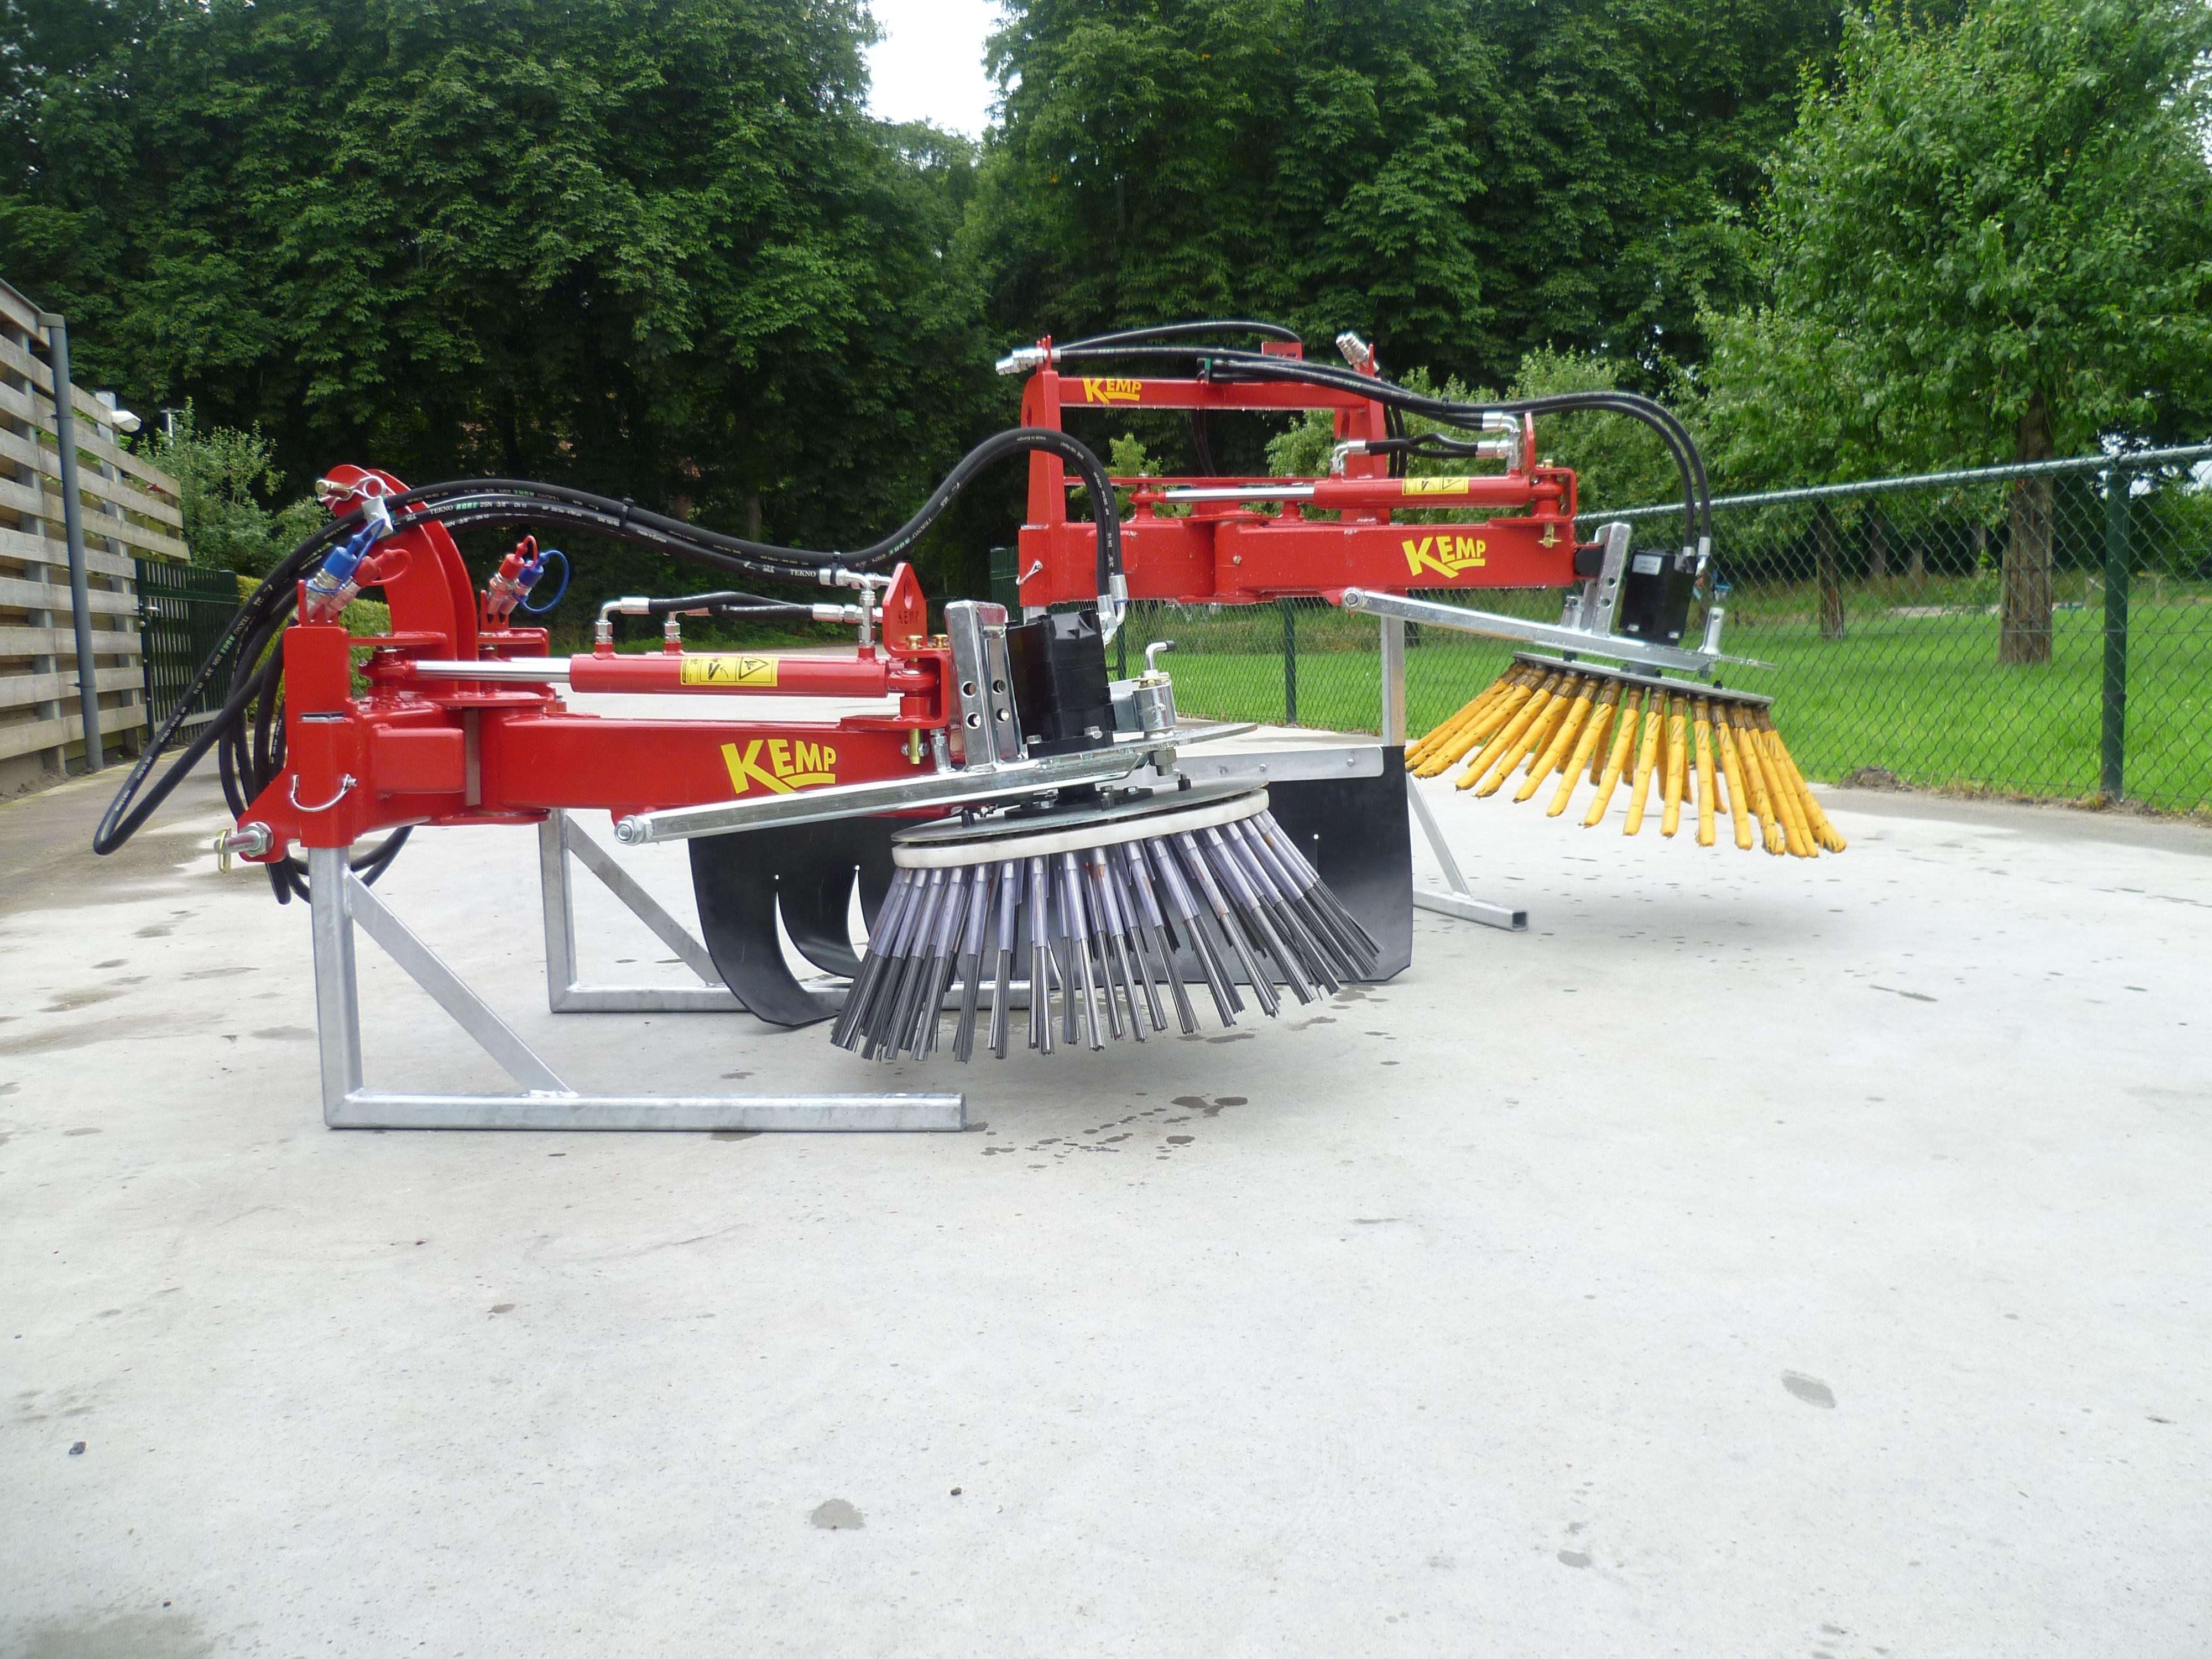 Ukrudtsbørste-Kemp-machines-2